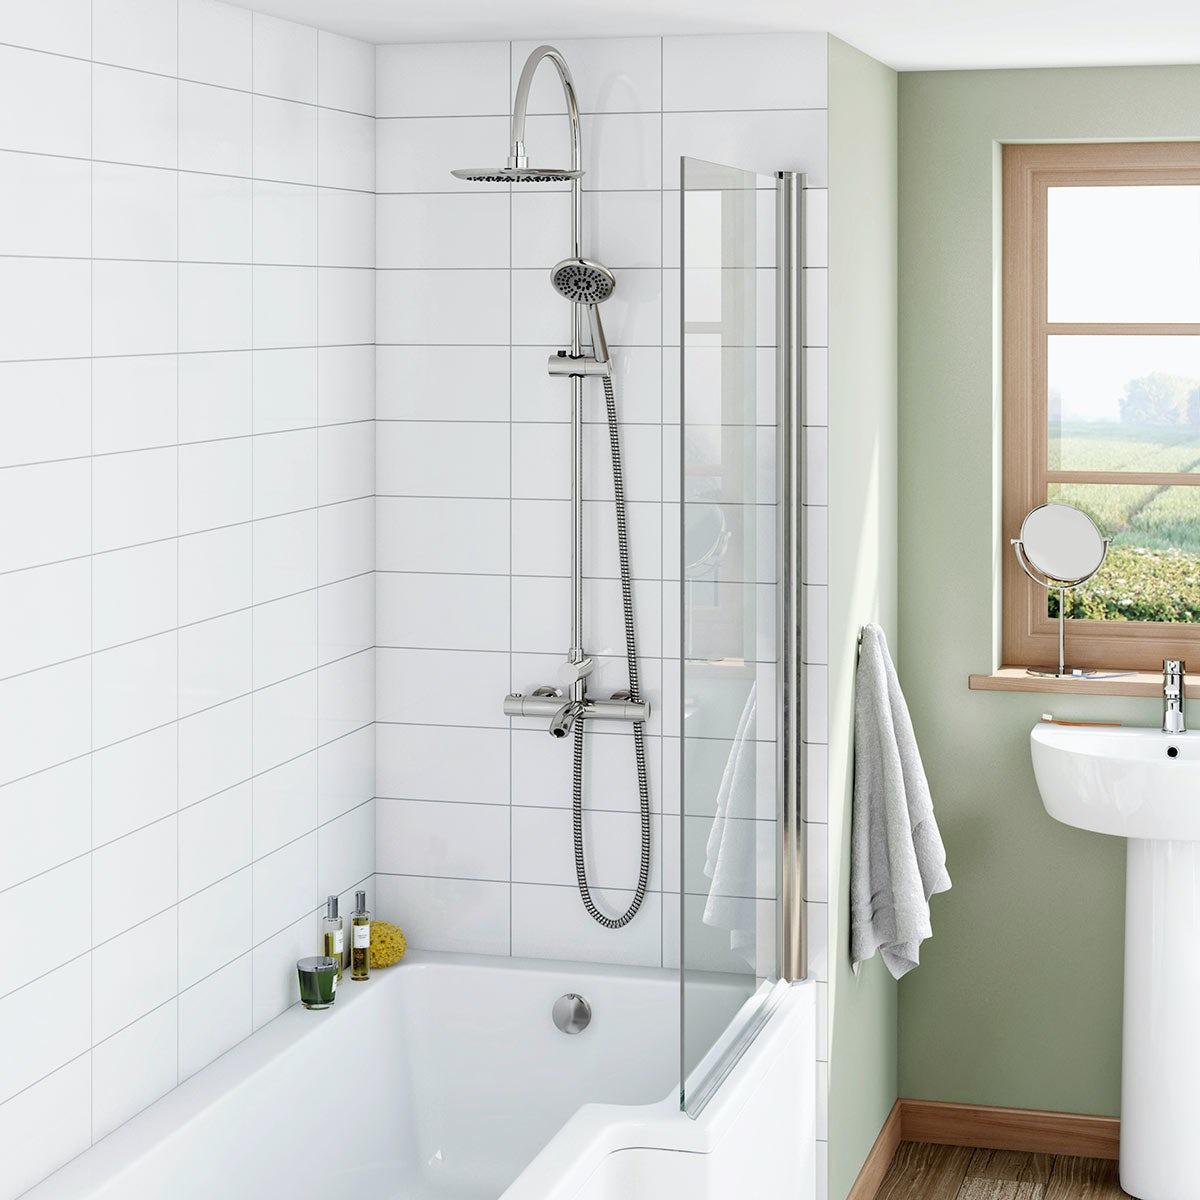 Orchard Phaze Shower Bath Filler And Shower Riser Rail